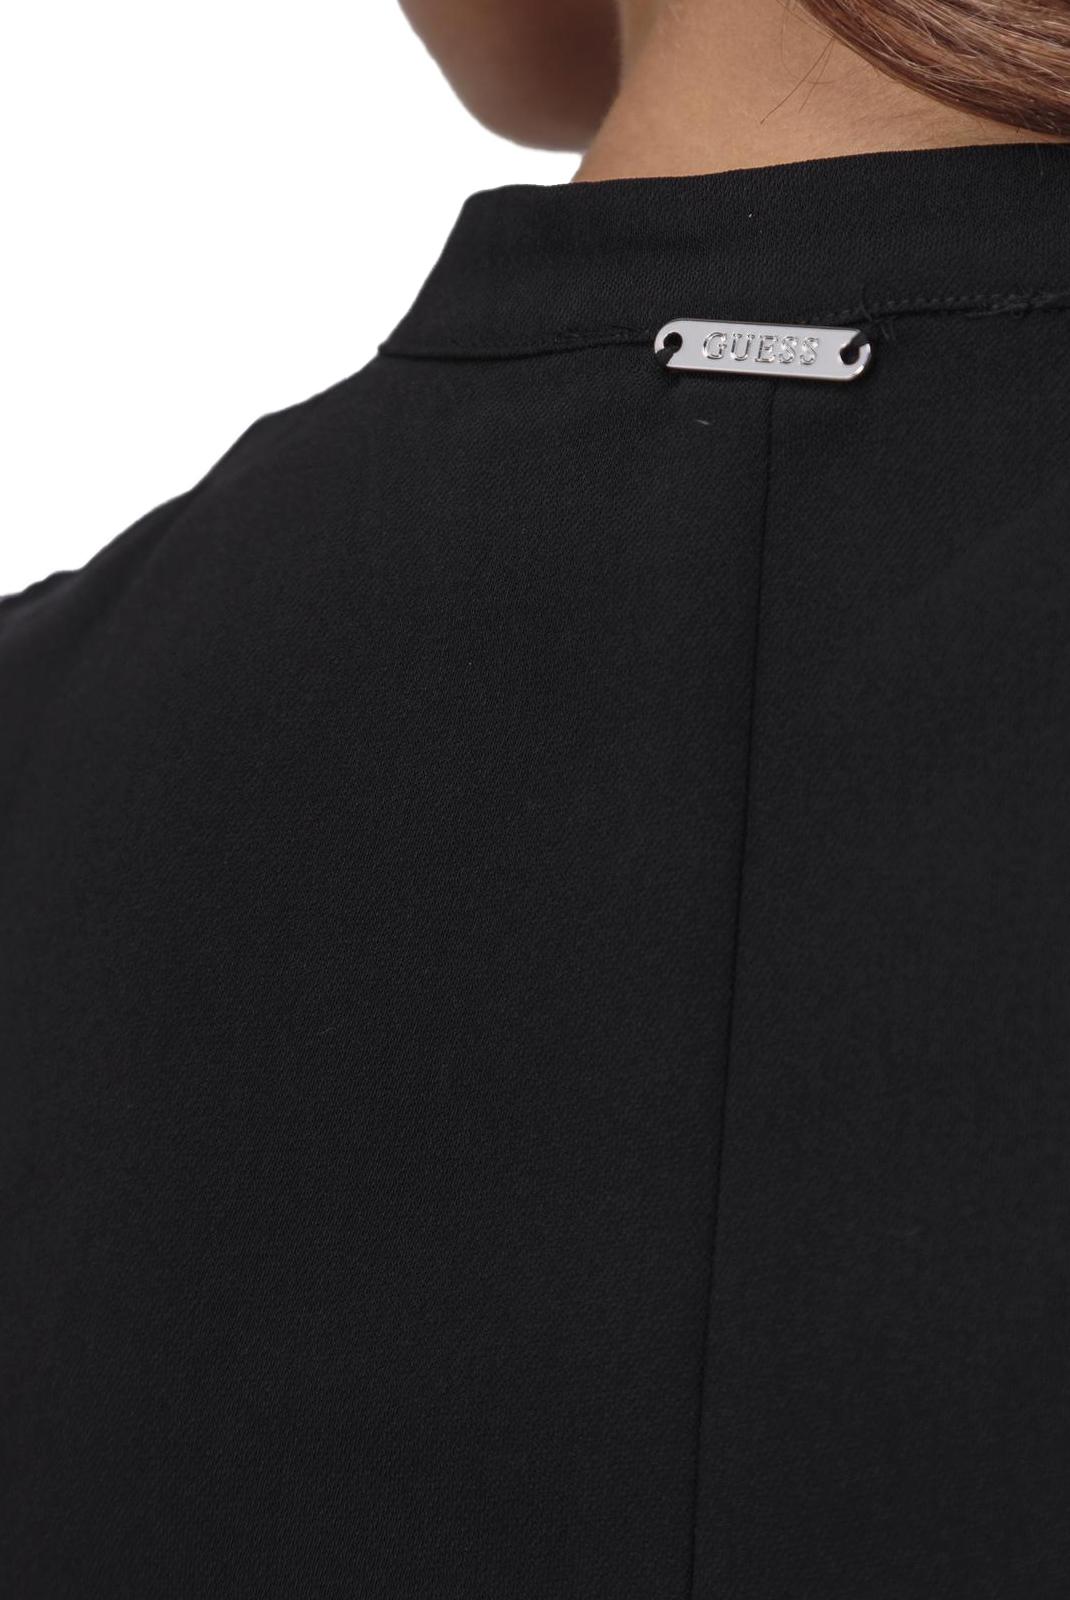 FEMME  Guess jeans W92H81 W9X50 JBLK